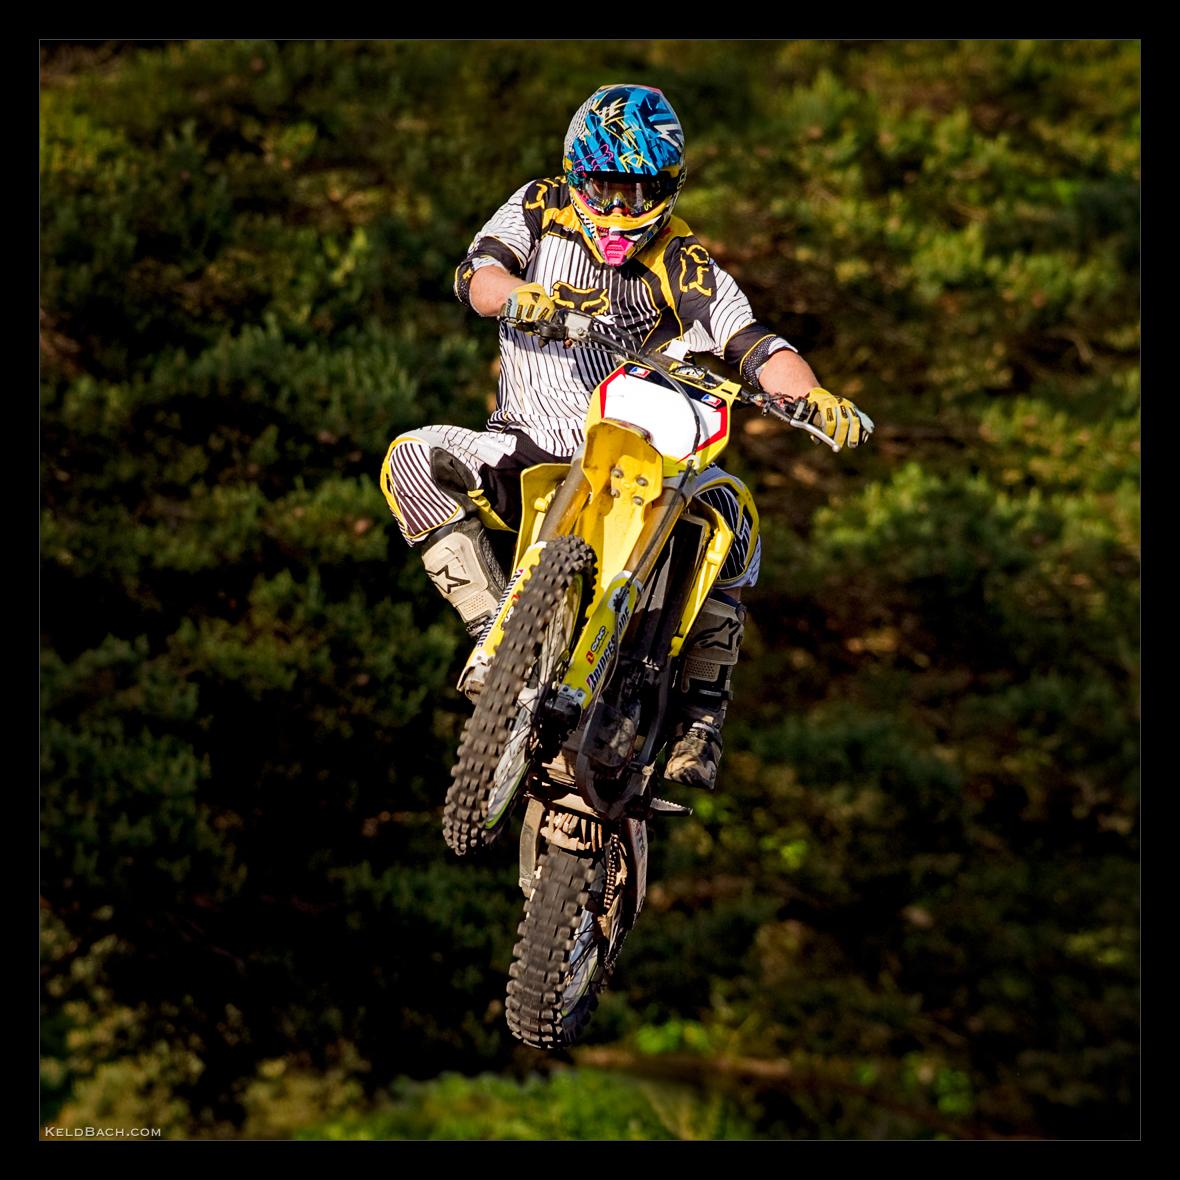 Flying Biker by KeldBach